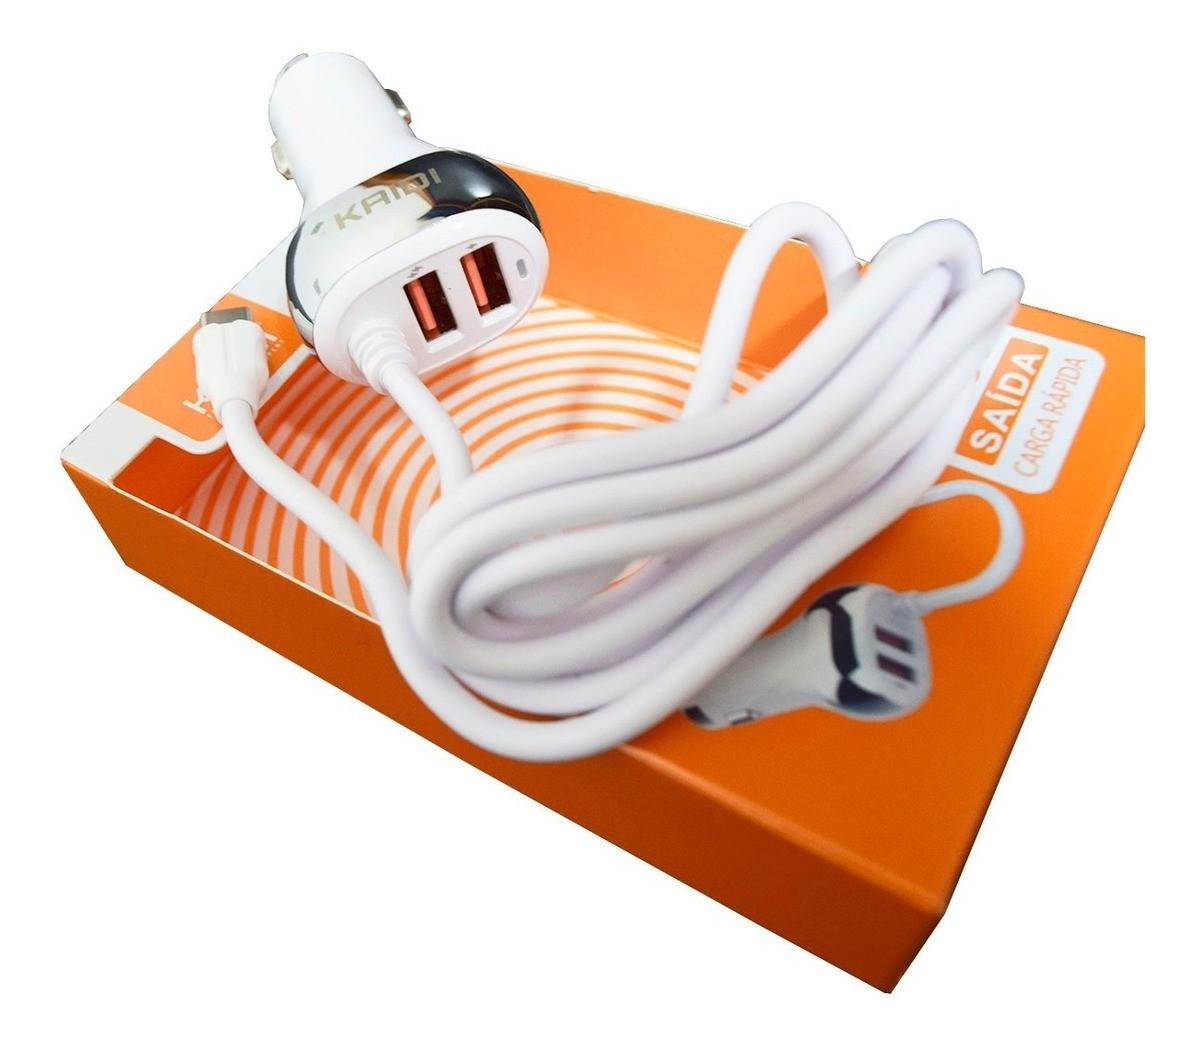 Carregador Veicular 2 USB + Cabo TIPO C 4.8a Kd132C - KAIDI